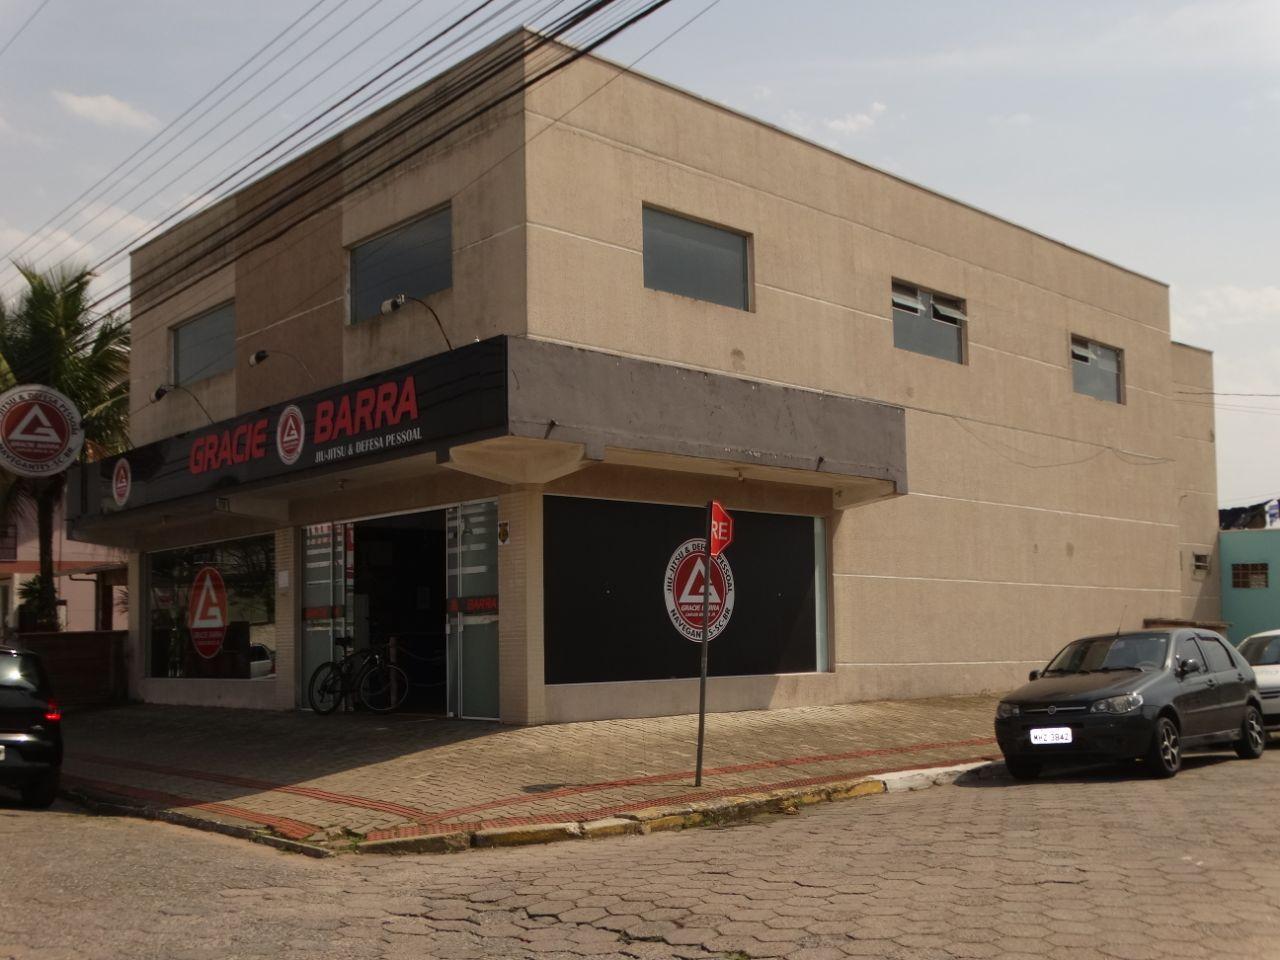 Sala - Centro - Navegantes - Aluguel - R$ 4.750,00